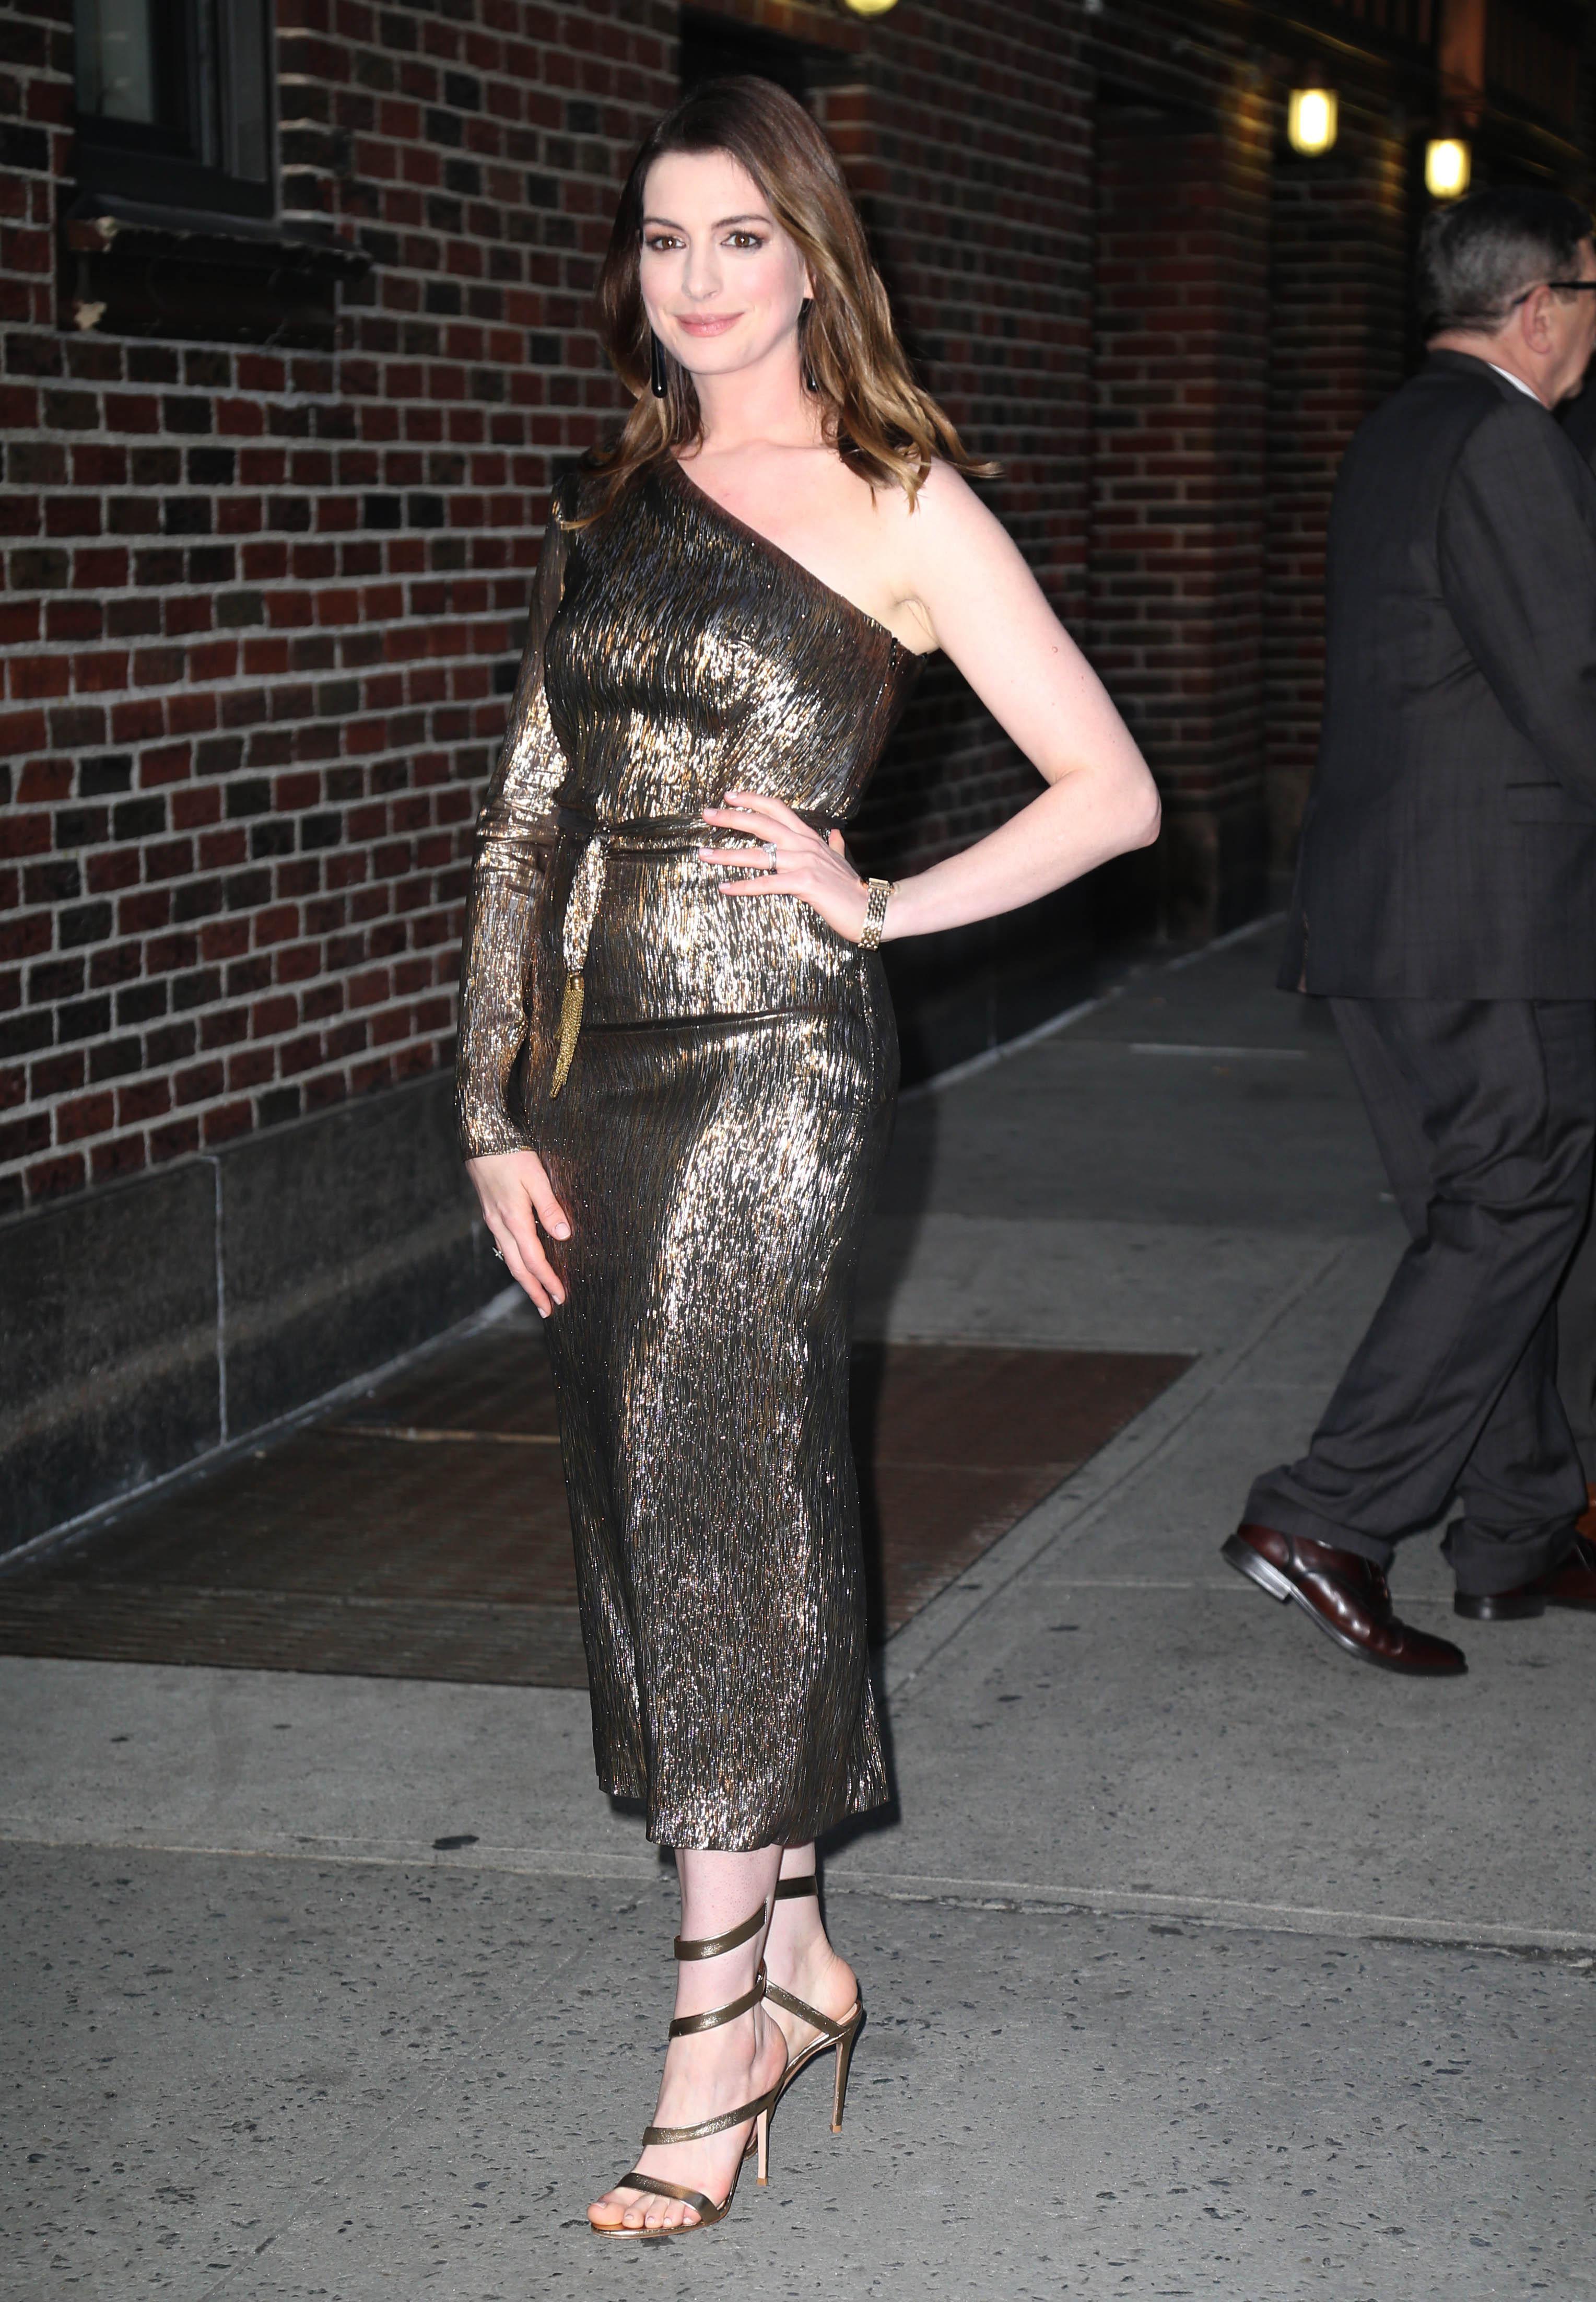 Anne hataway sexy